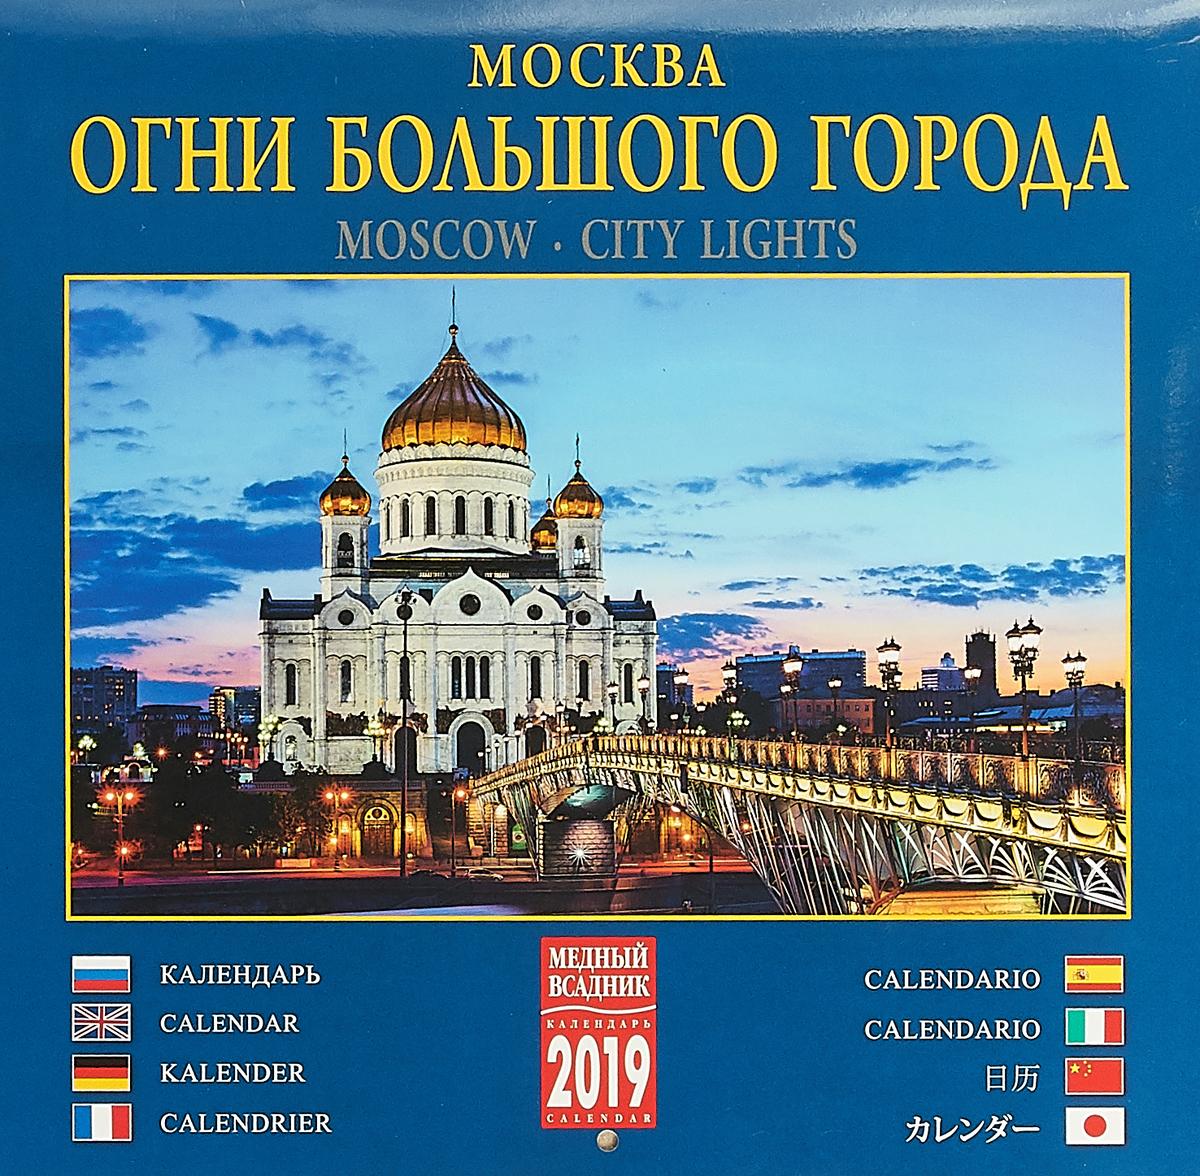 Календарь на спирали на 2019 год. Москва. Огни большого города